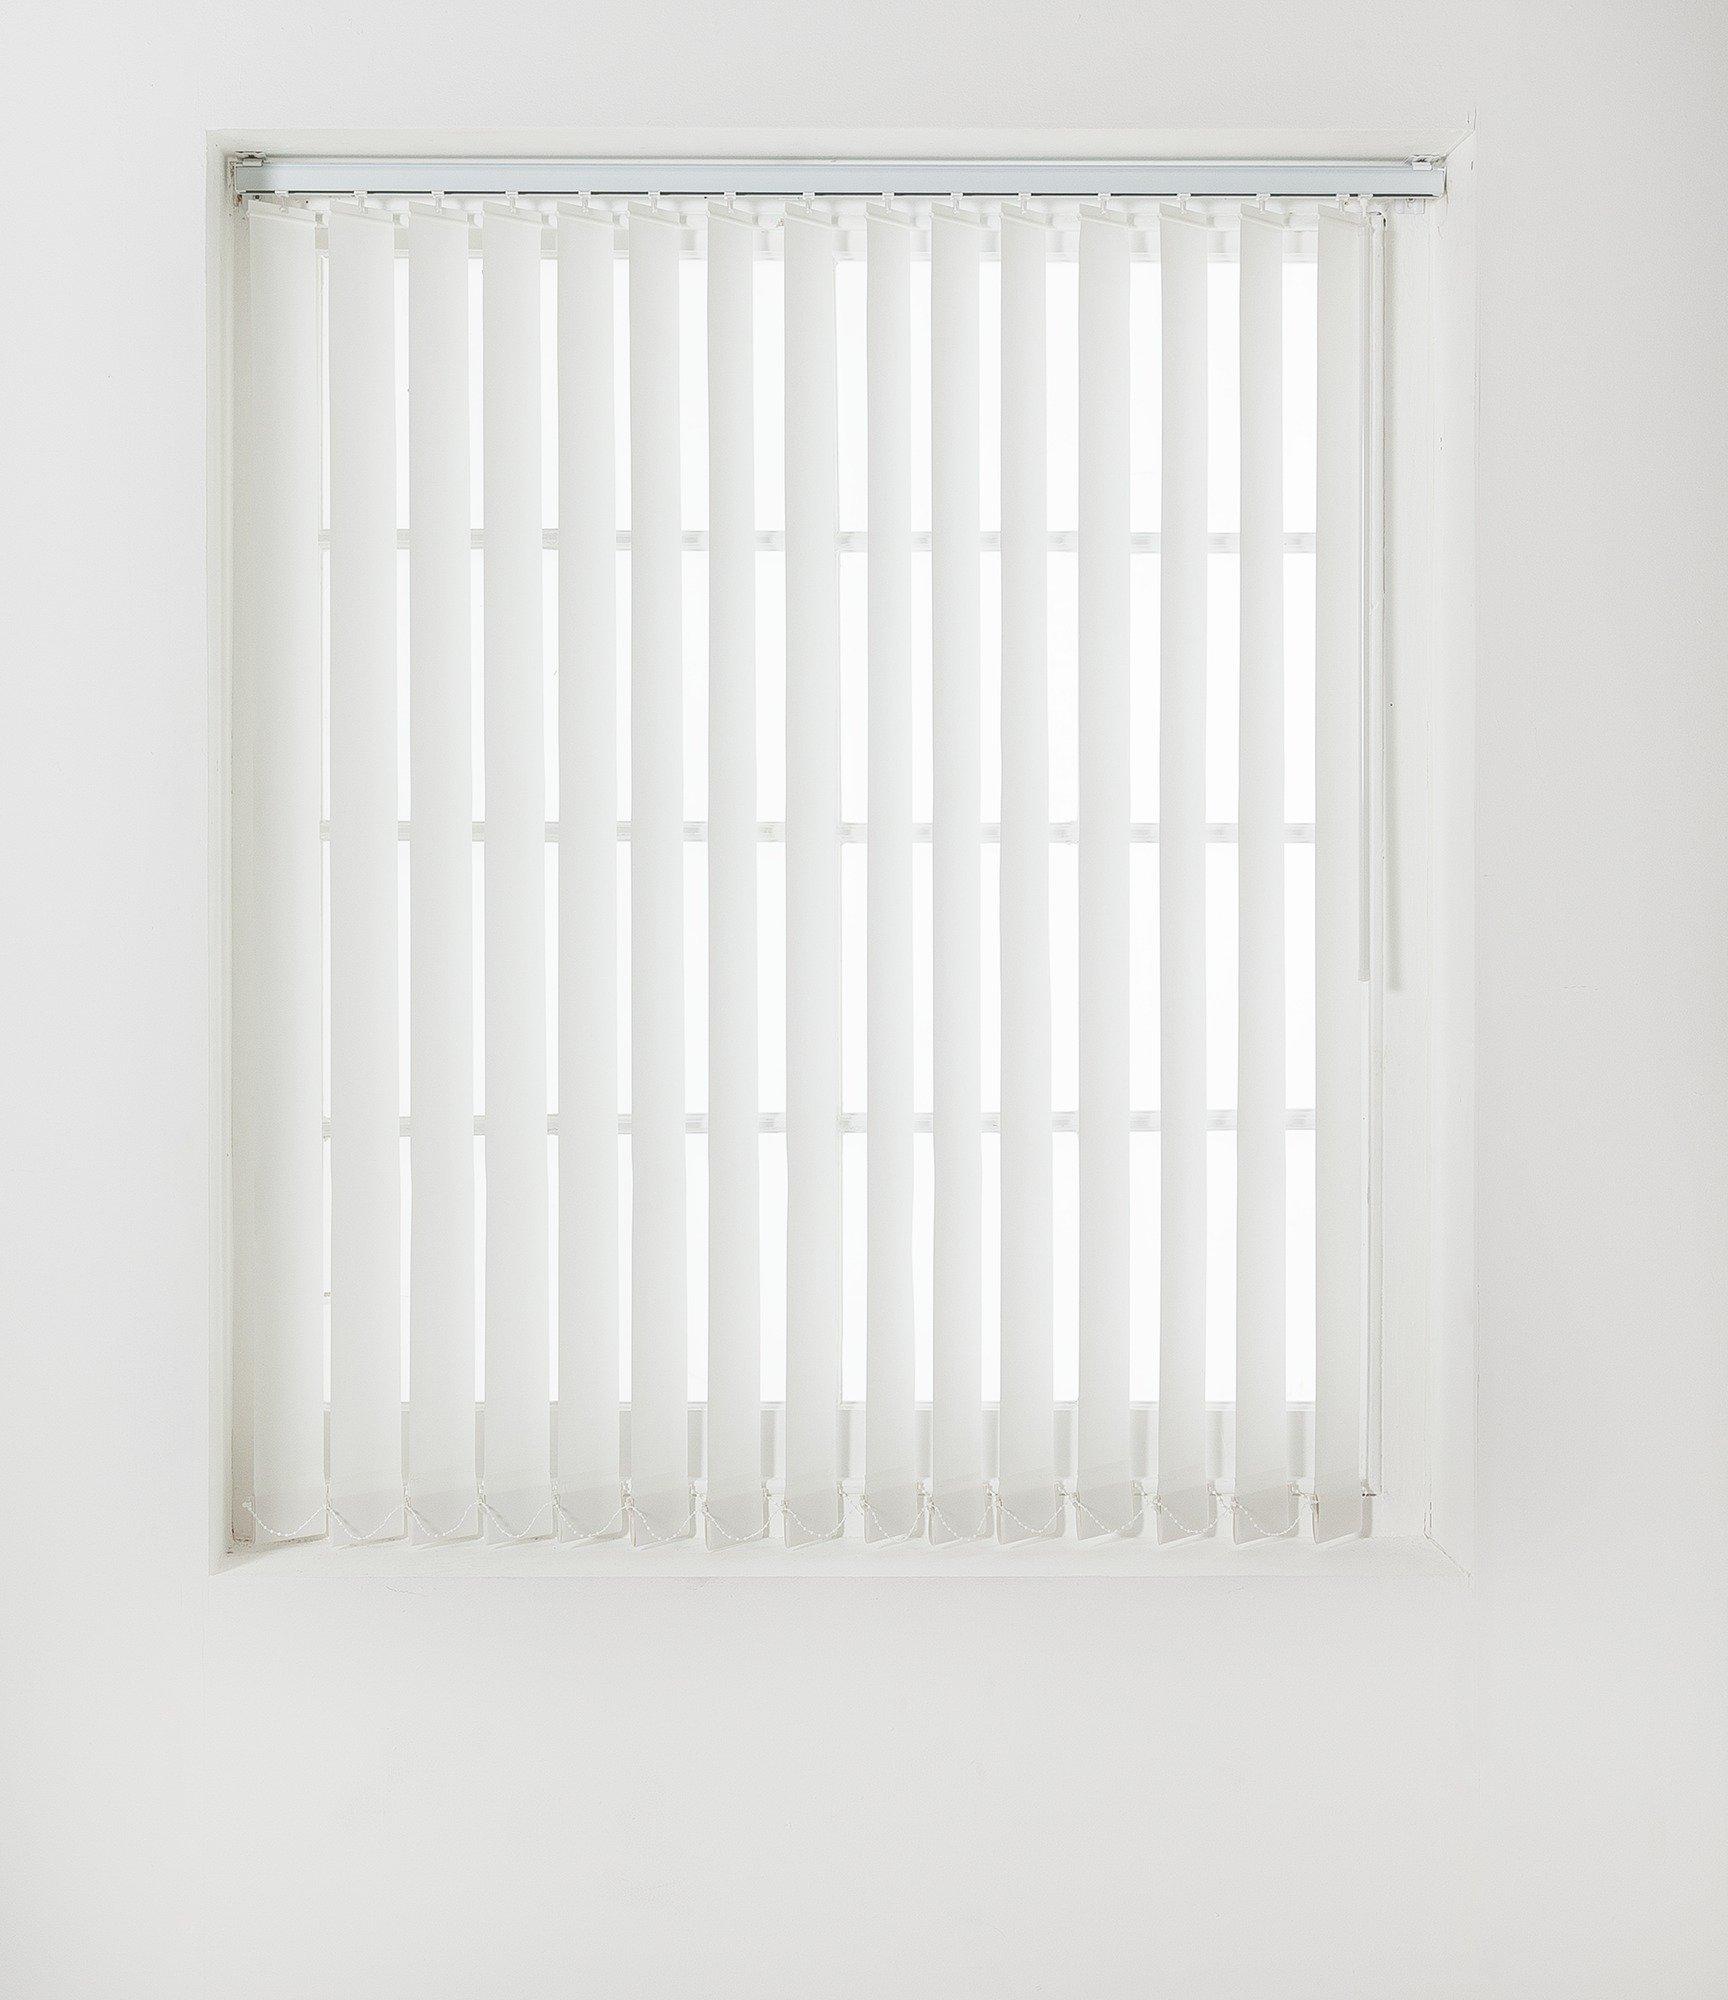 home-vertical-blinds-slat-pack-122x229cm-daylight